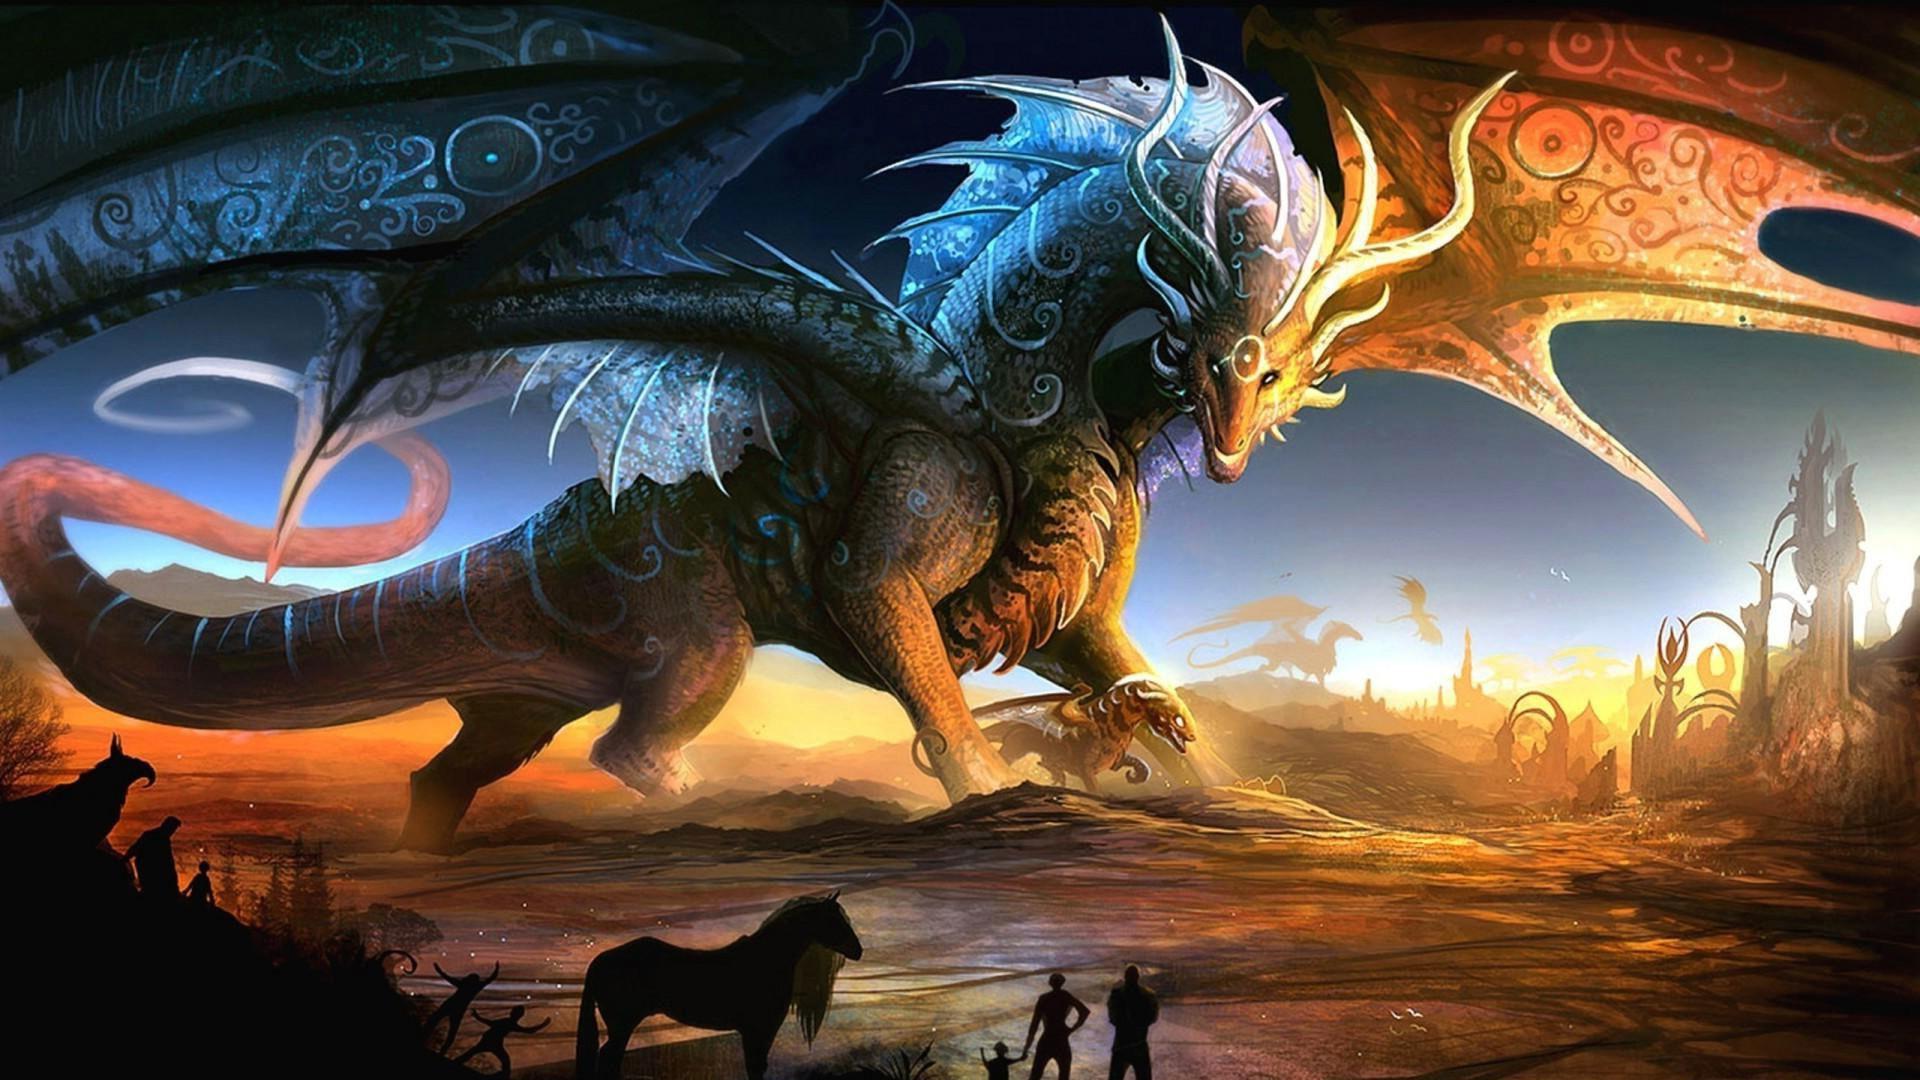 Res: 1920x1080, Fantasy Dragon Wallpaper